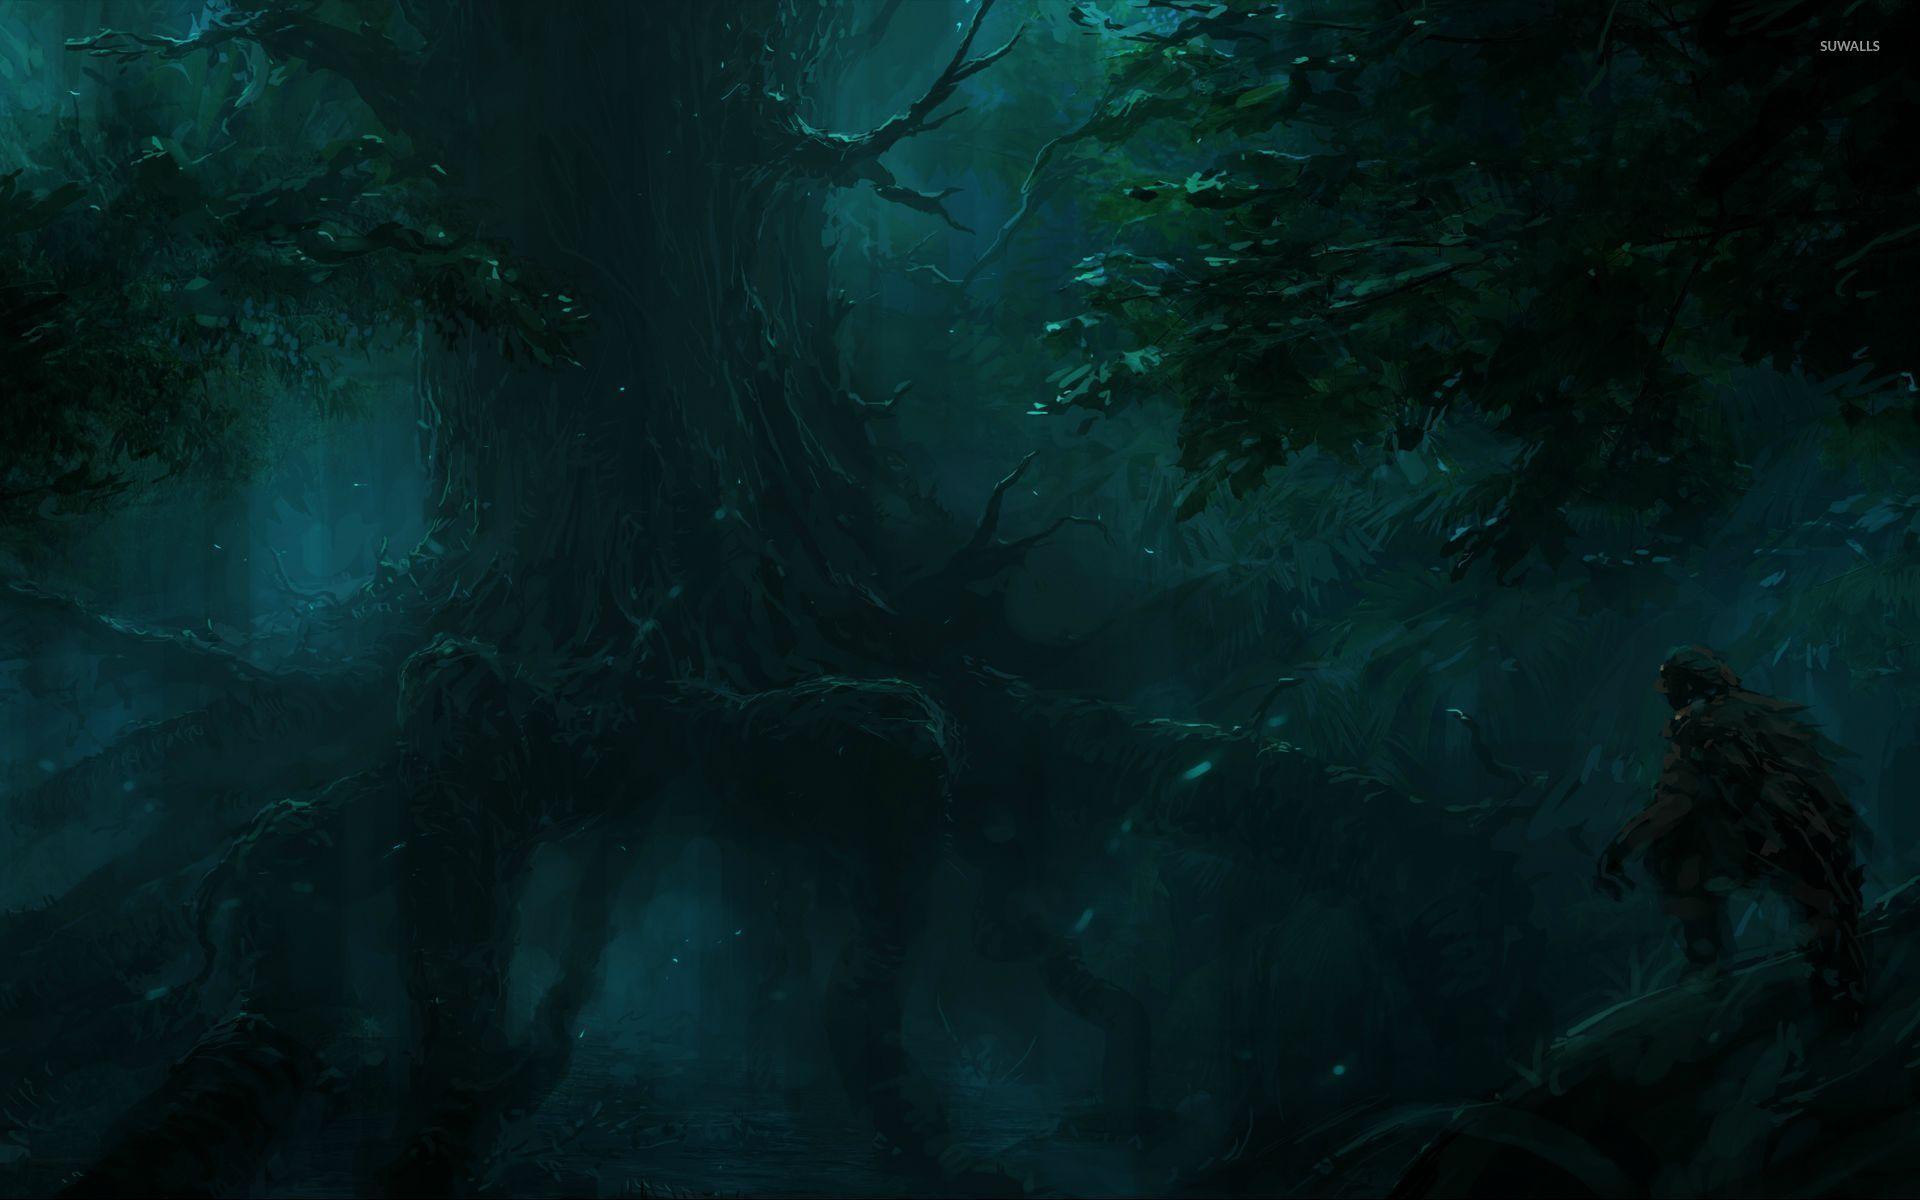 hunter in the dark forest wallpaper - fantasy wallpapers - #29360